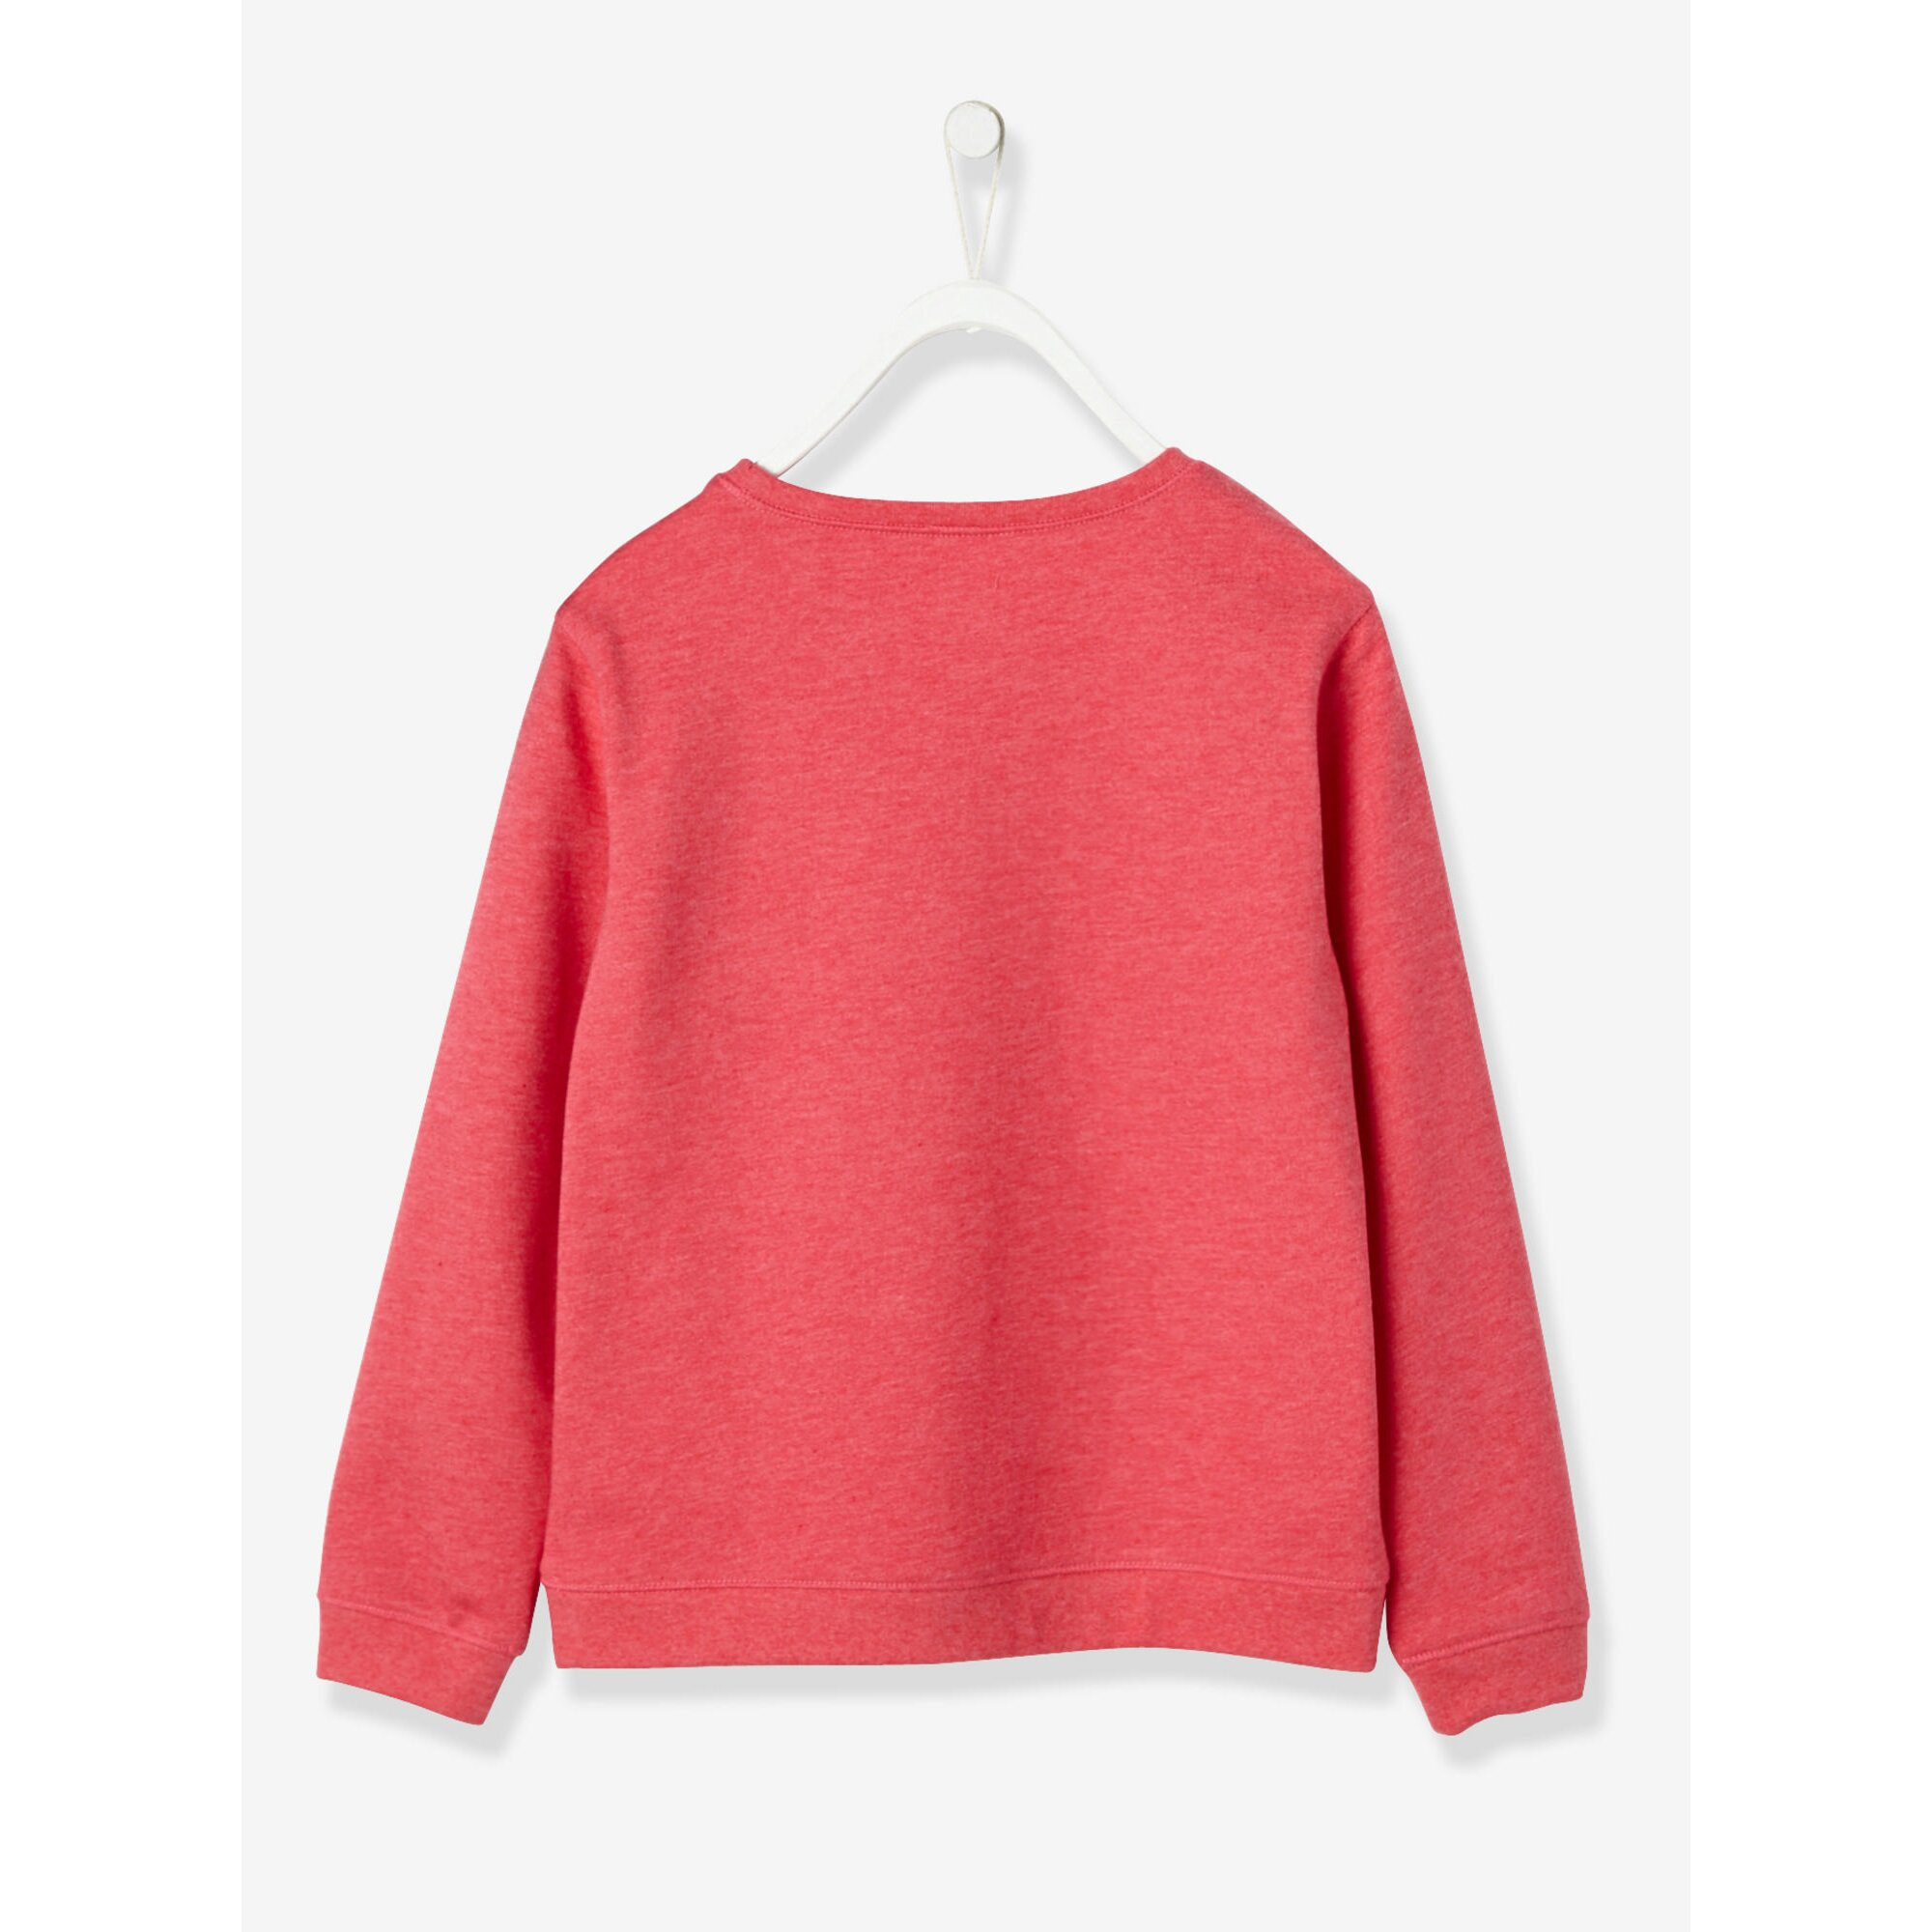 vertbaudet-sweatshirt-fur-madchen, 13.99 EUR @ babywalz-de